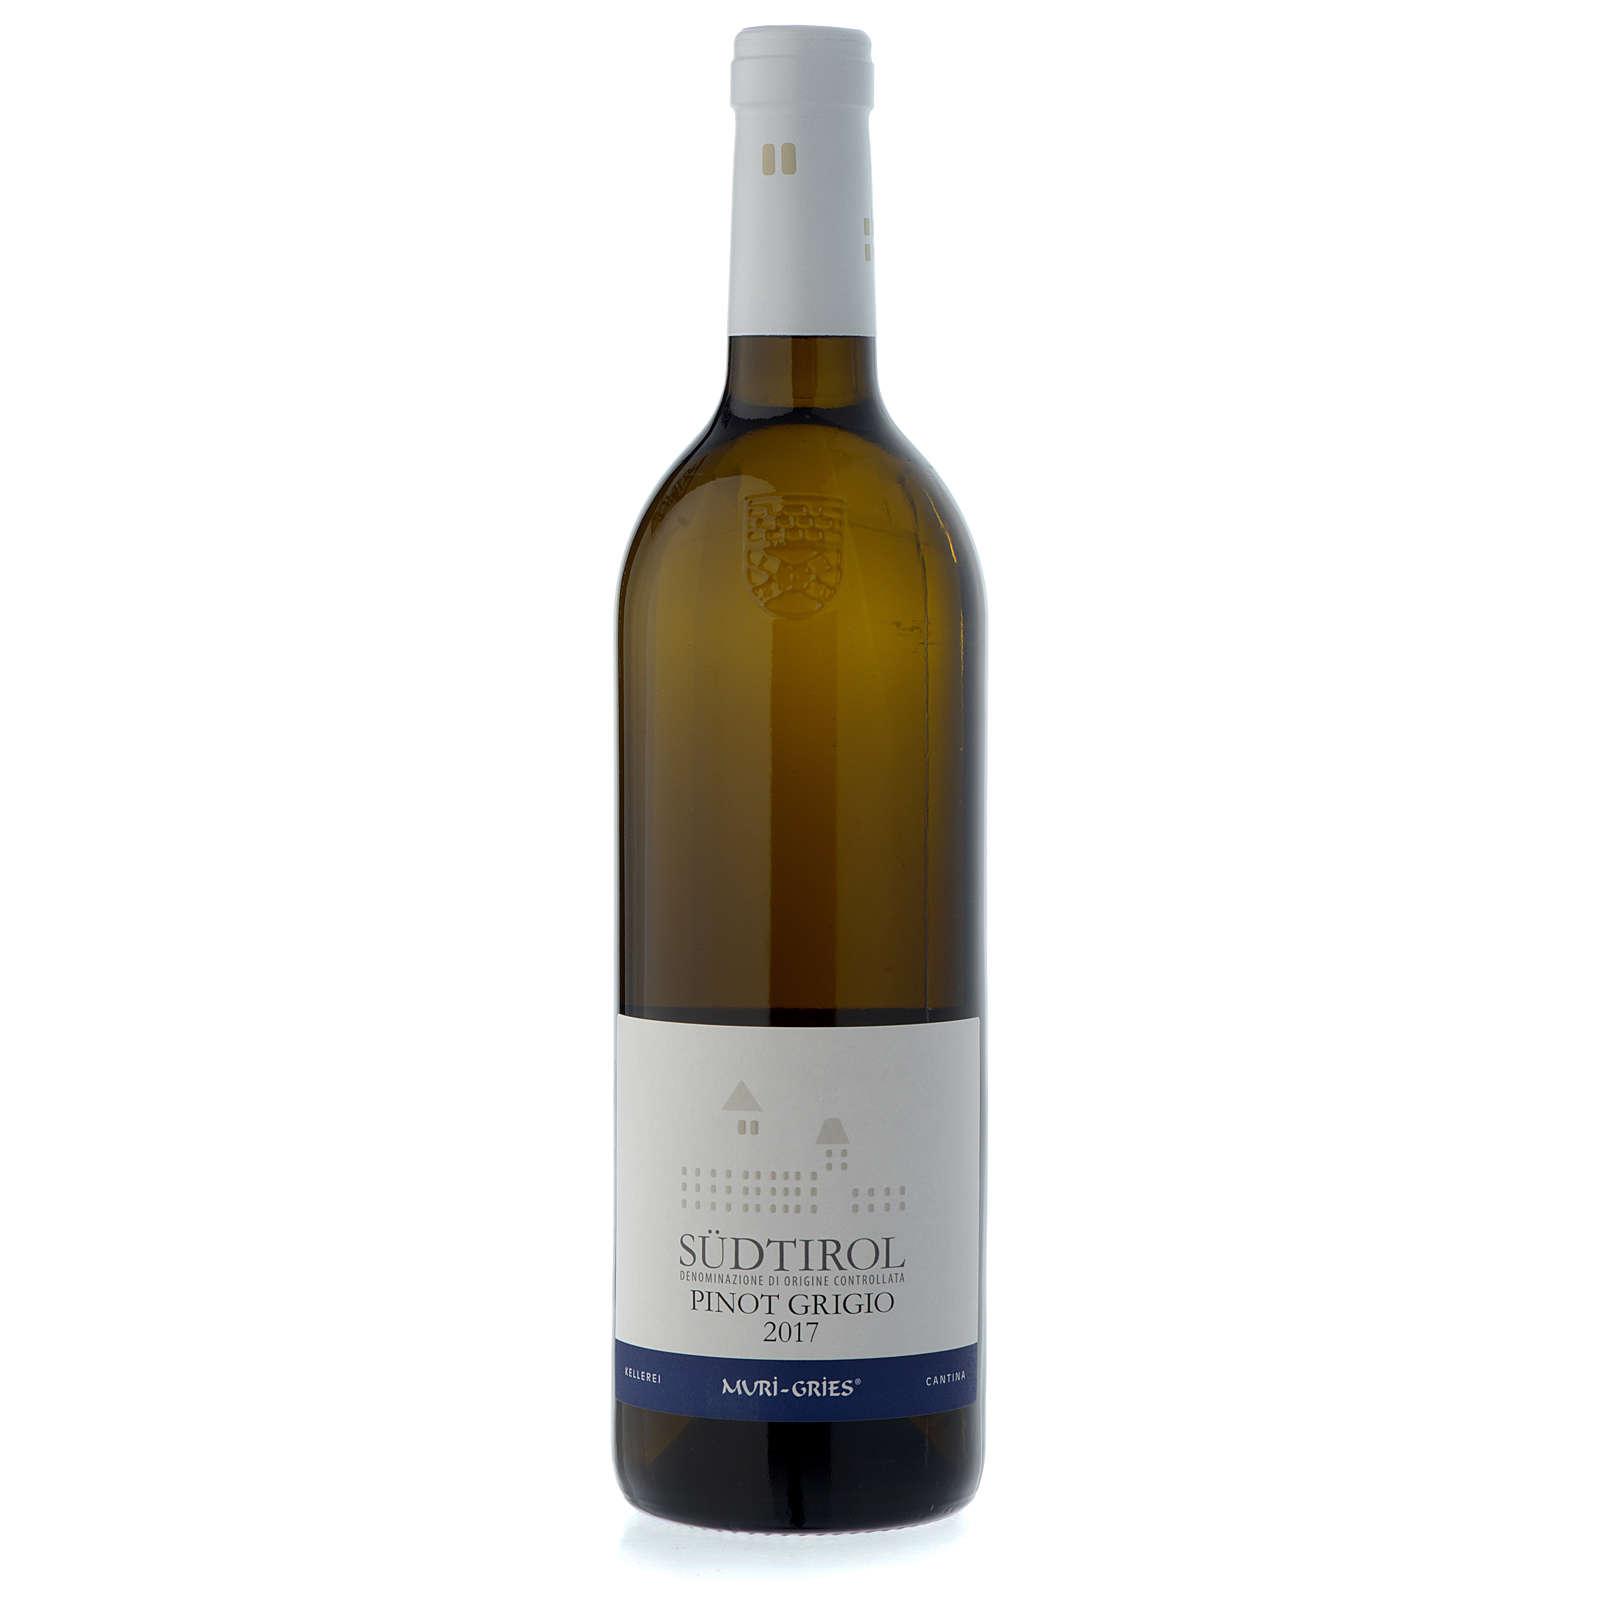 Vinho Pinot Grigio de Terlano DOC 2017 Abadia Muri Gries 750 ml 3